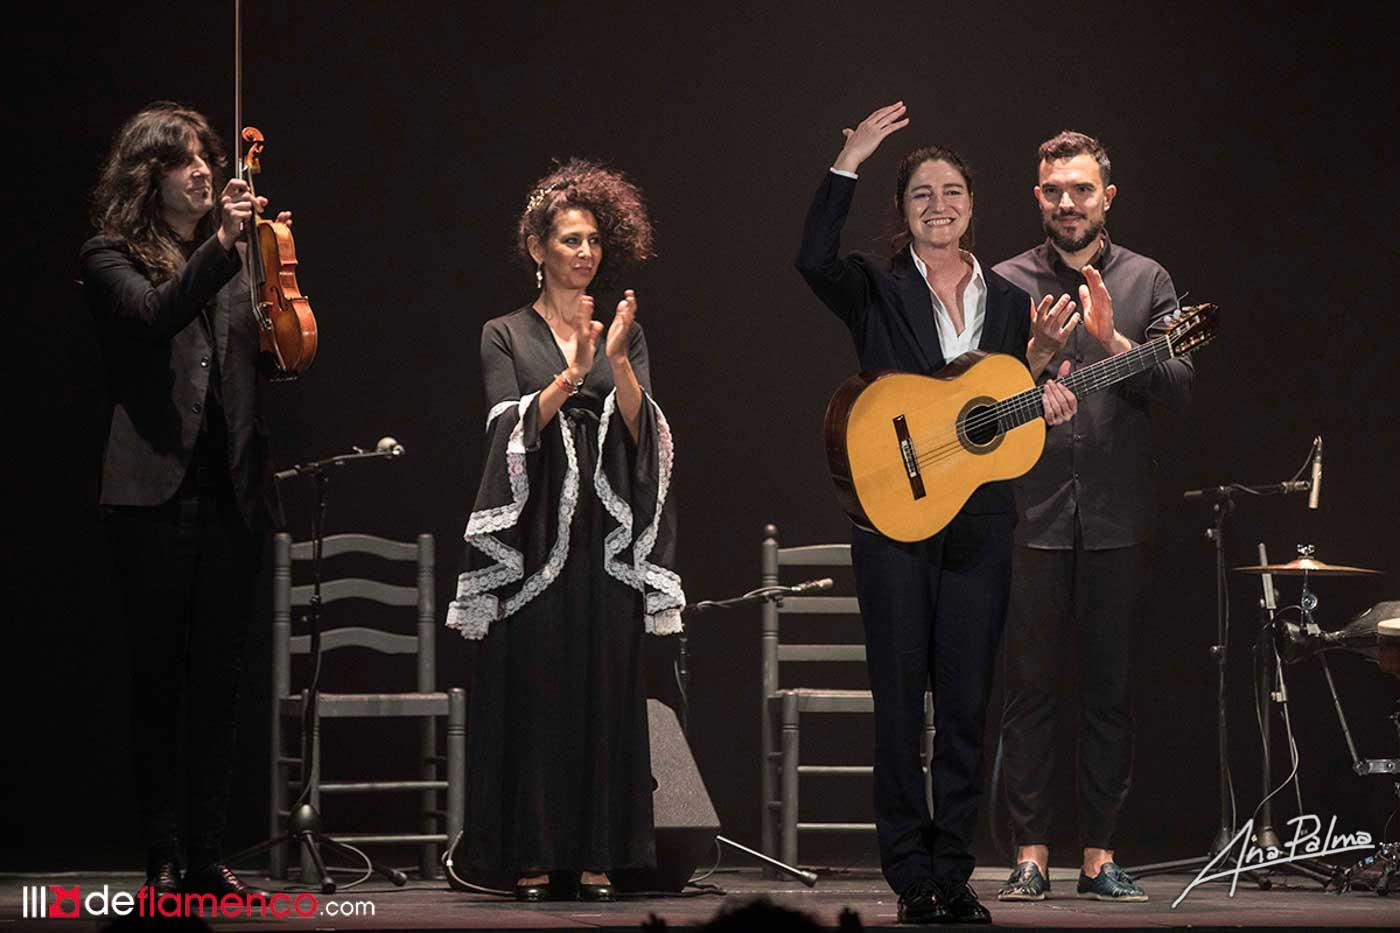 Antonia Jiménez - Festival de Jerez